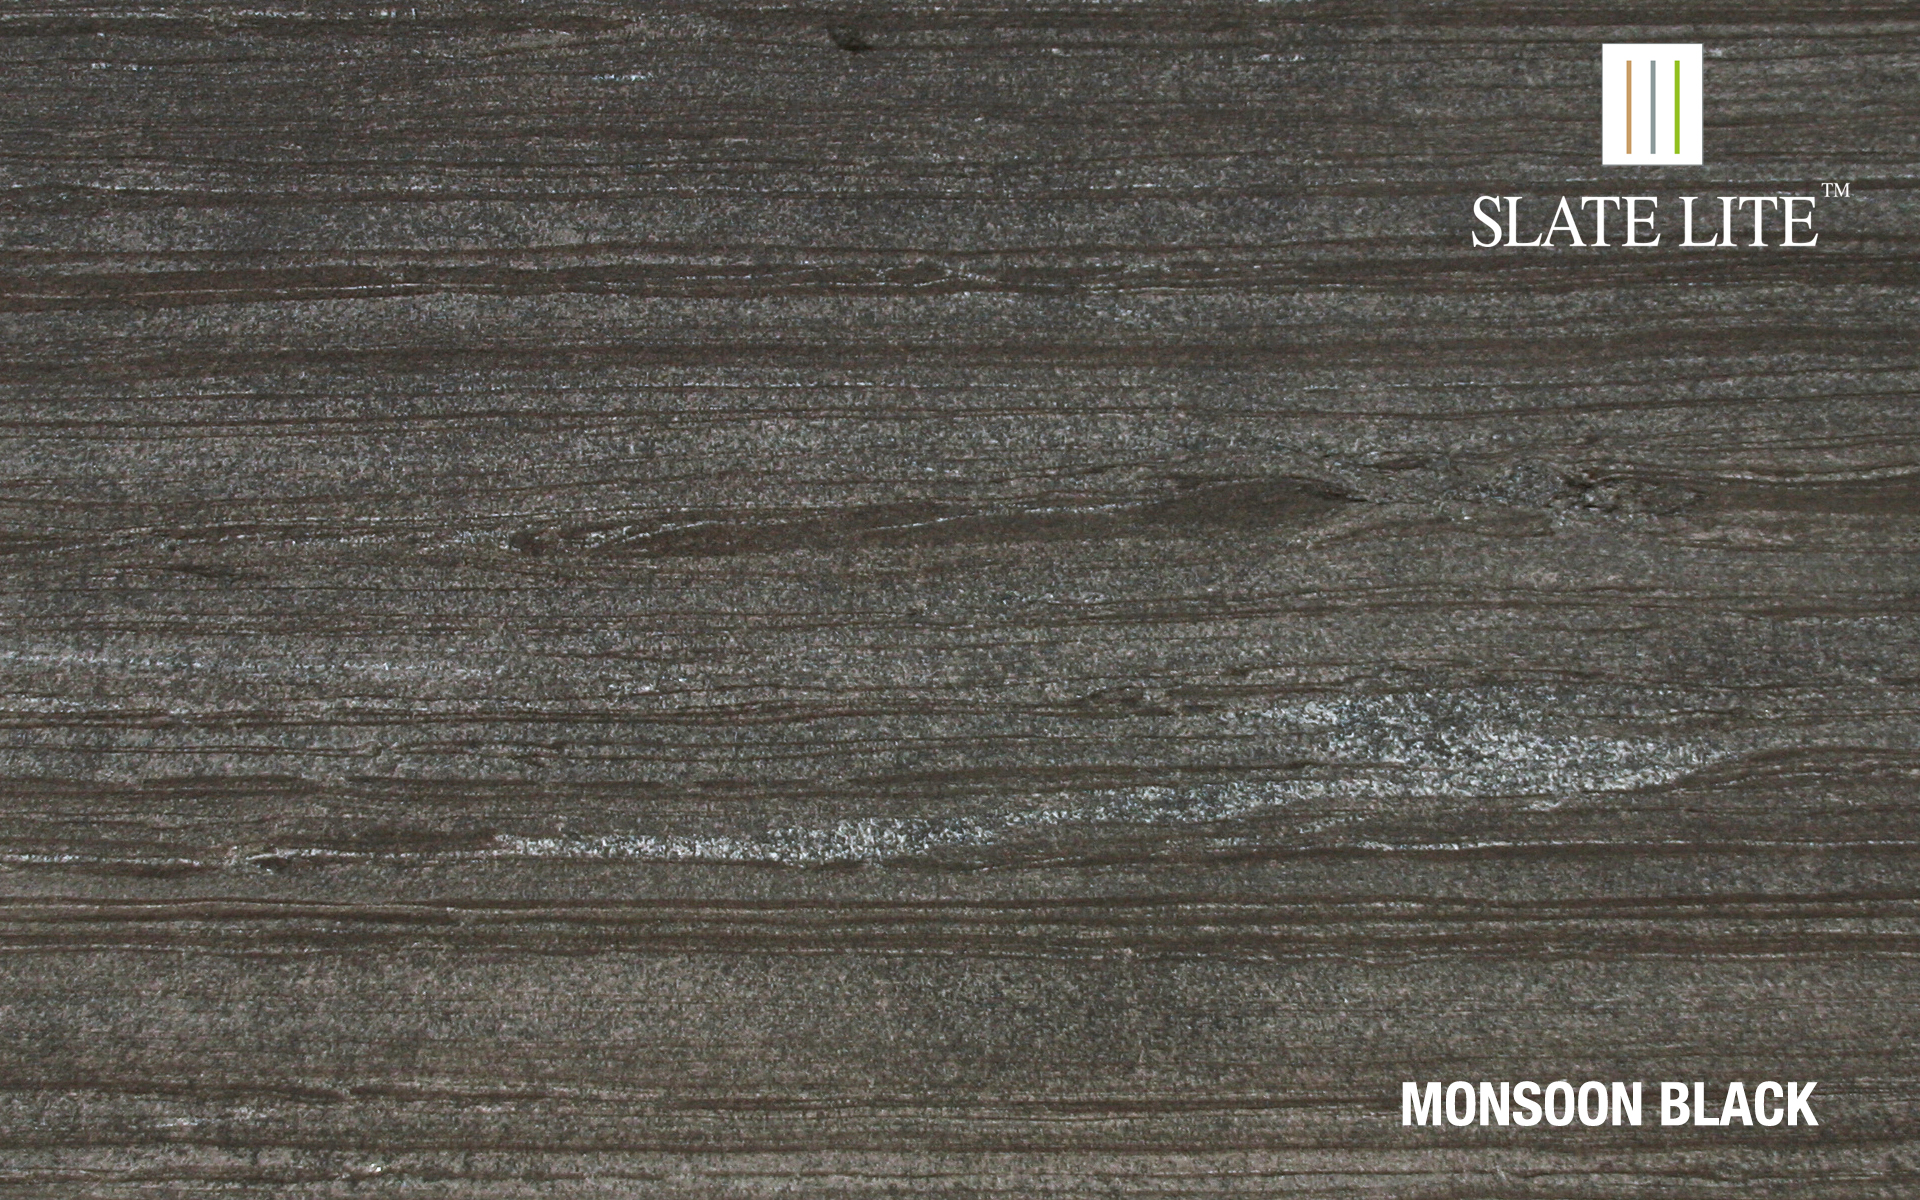 monsoonblack01.jpg